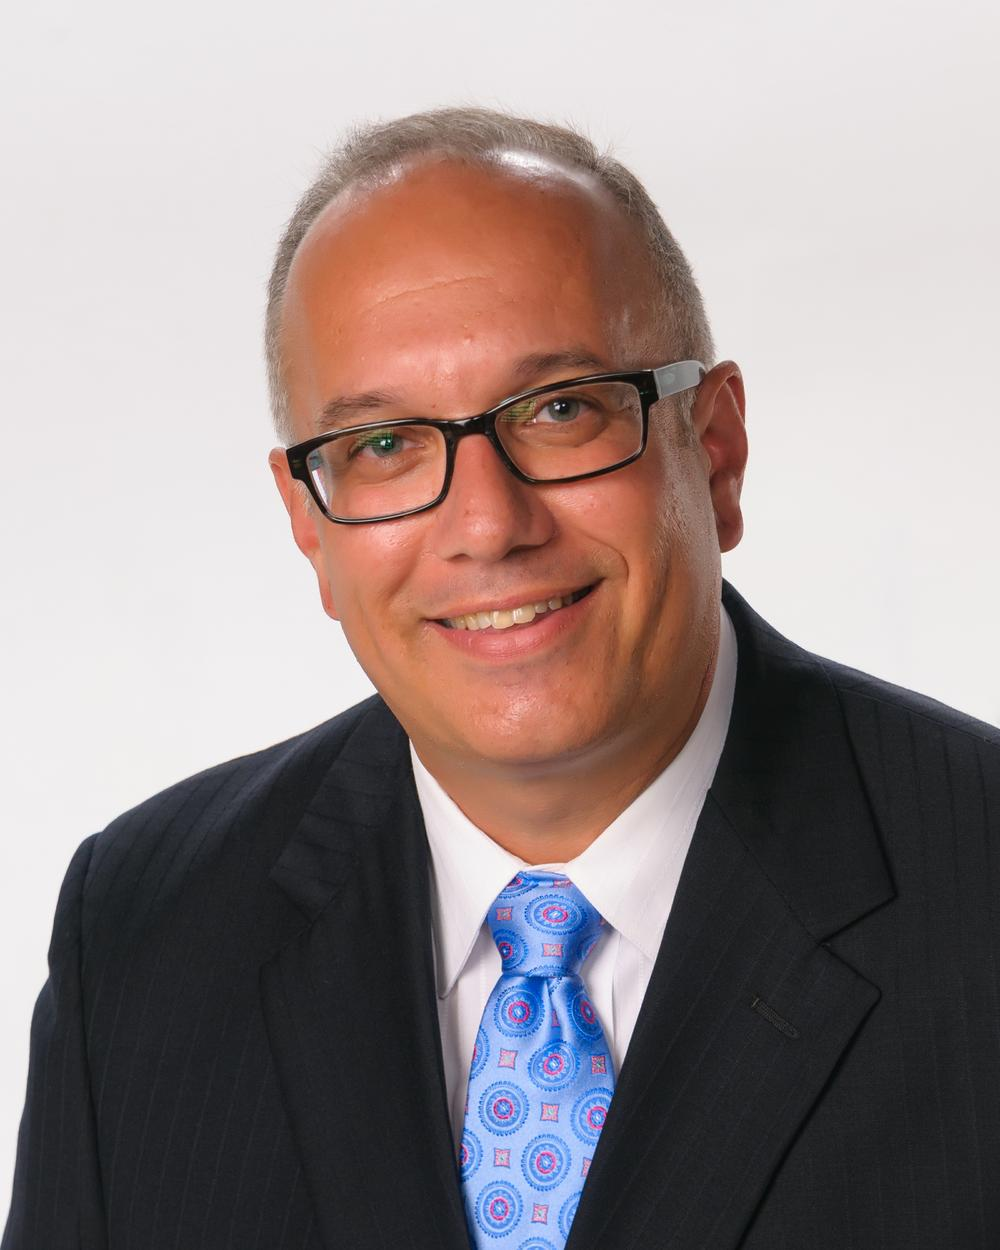 Michael J. Agriesti, CFP®, CRPC, LUTCF Photo